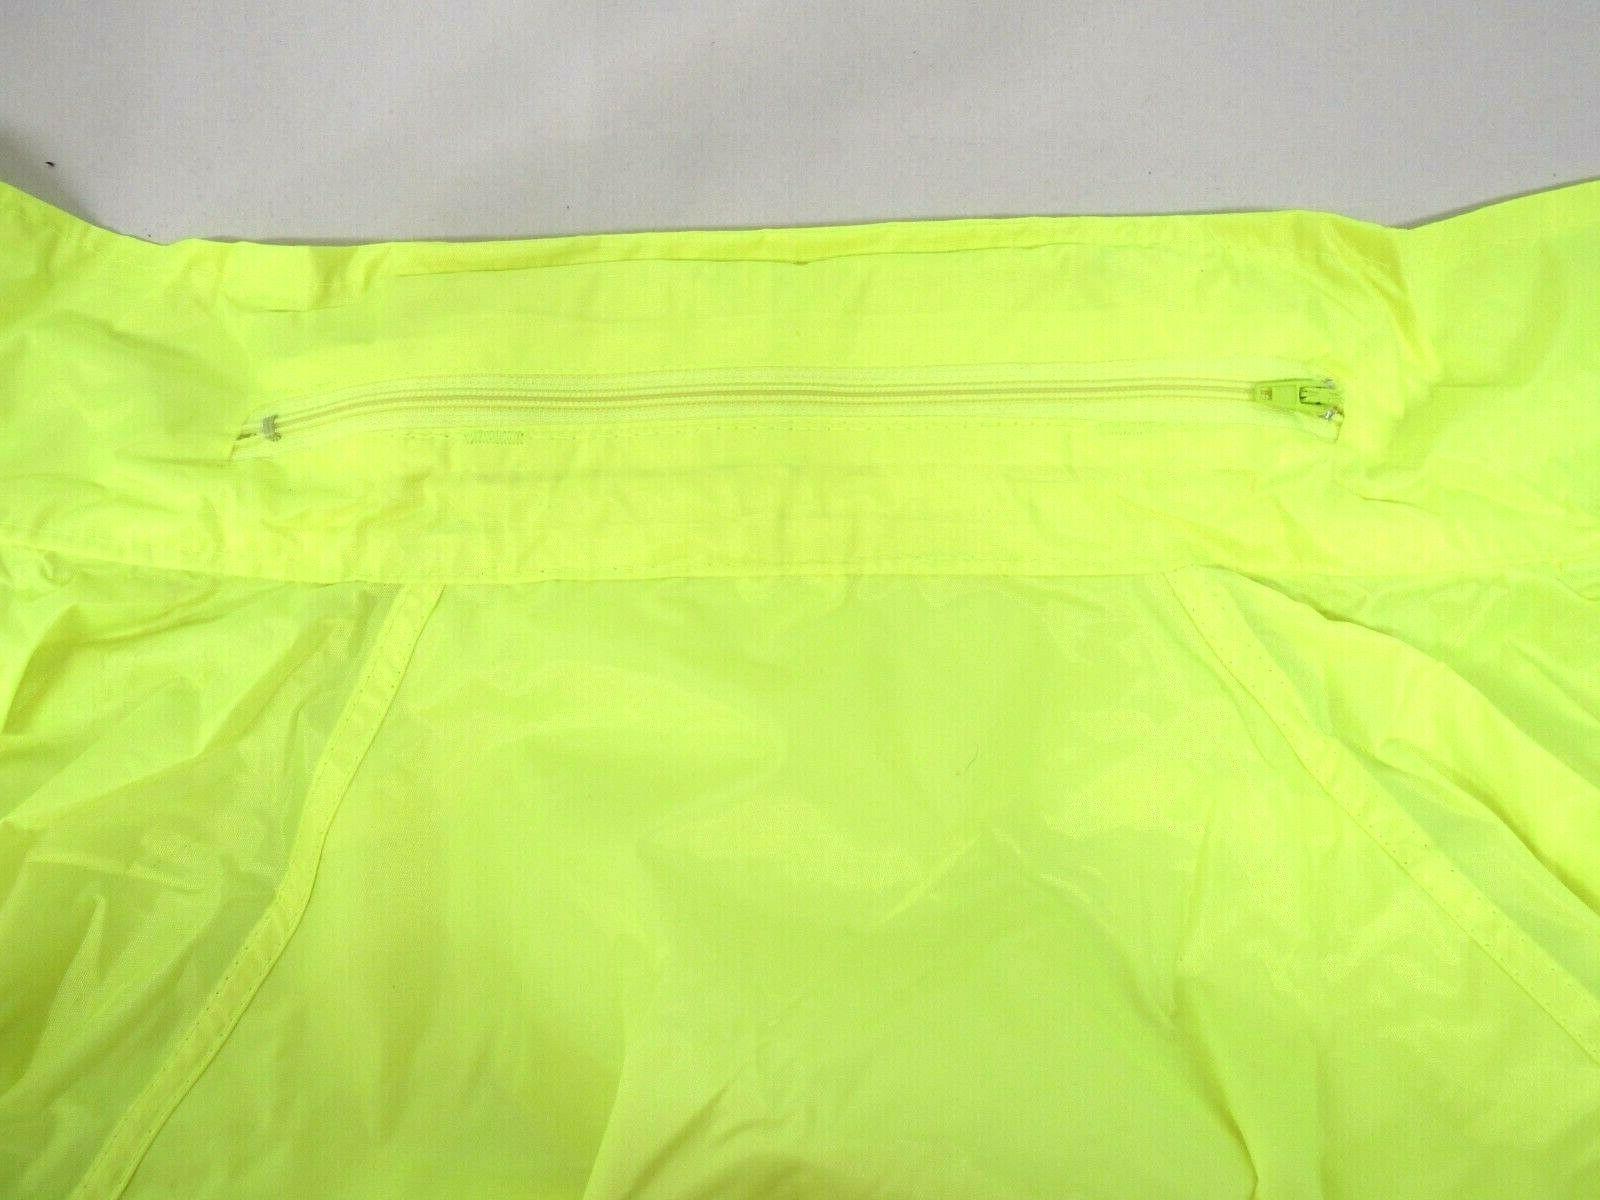 Reflective Tape Raincoat Jacket Design Road